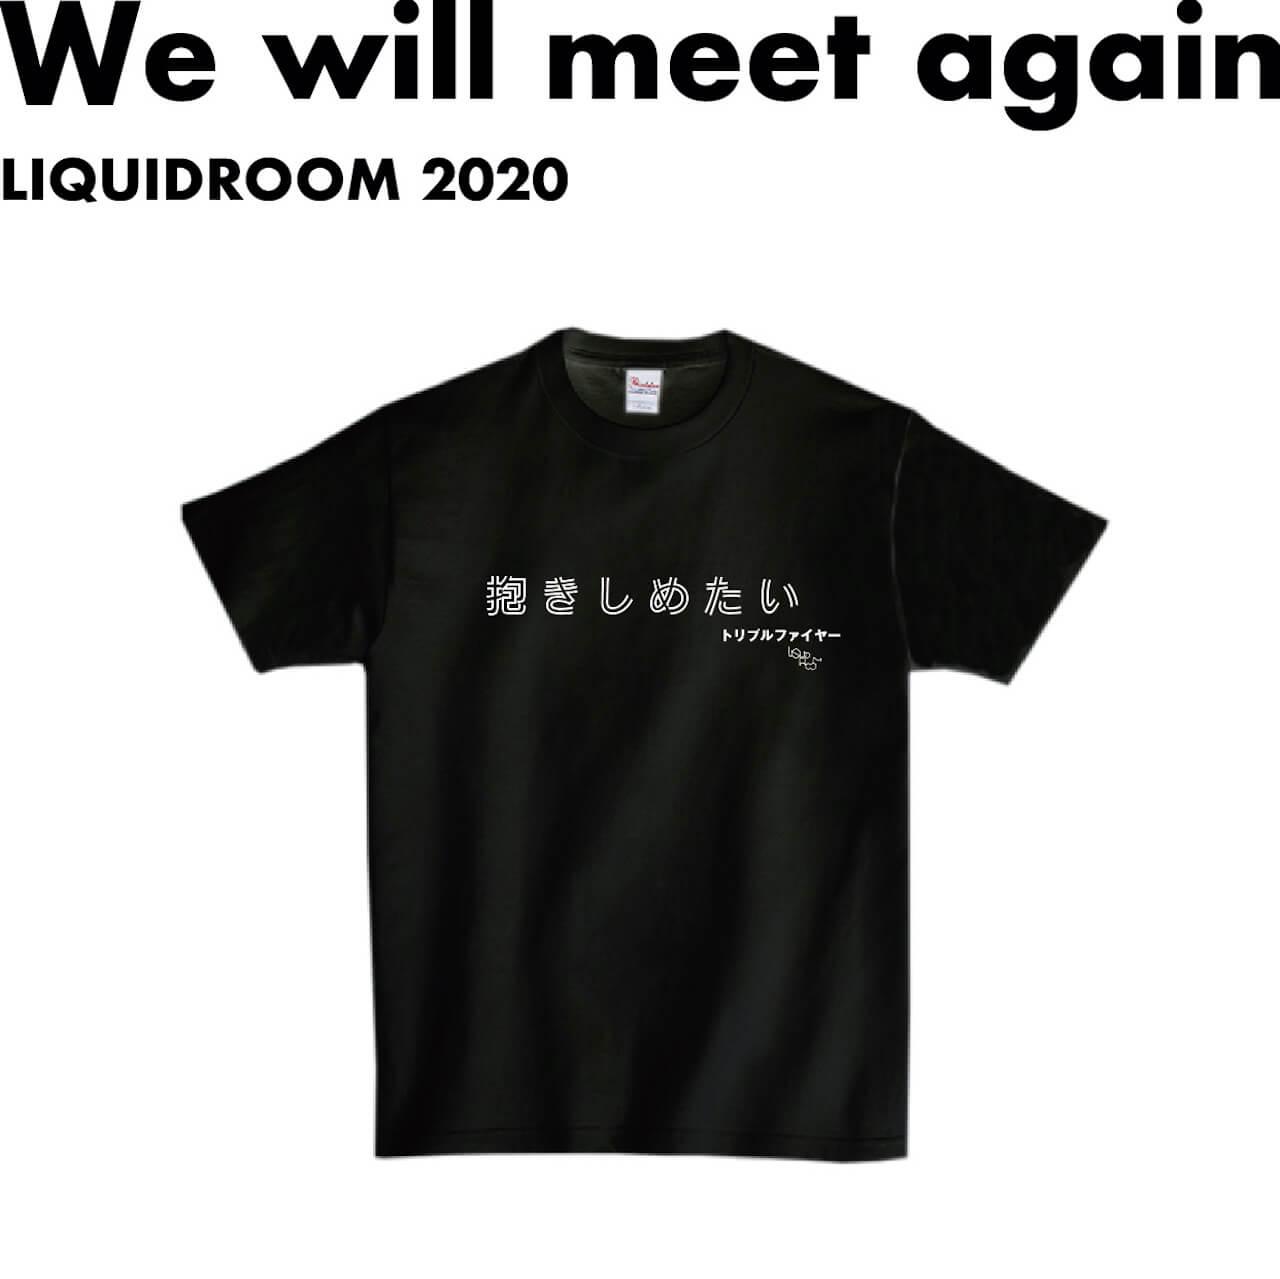 LIQUIDROOMのコラボTプロジェクト〈We will meet again〉にミツメ、トリプルファイヤーが参加 music200625-liquidroom-mitsume-triplefire-1-1